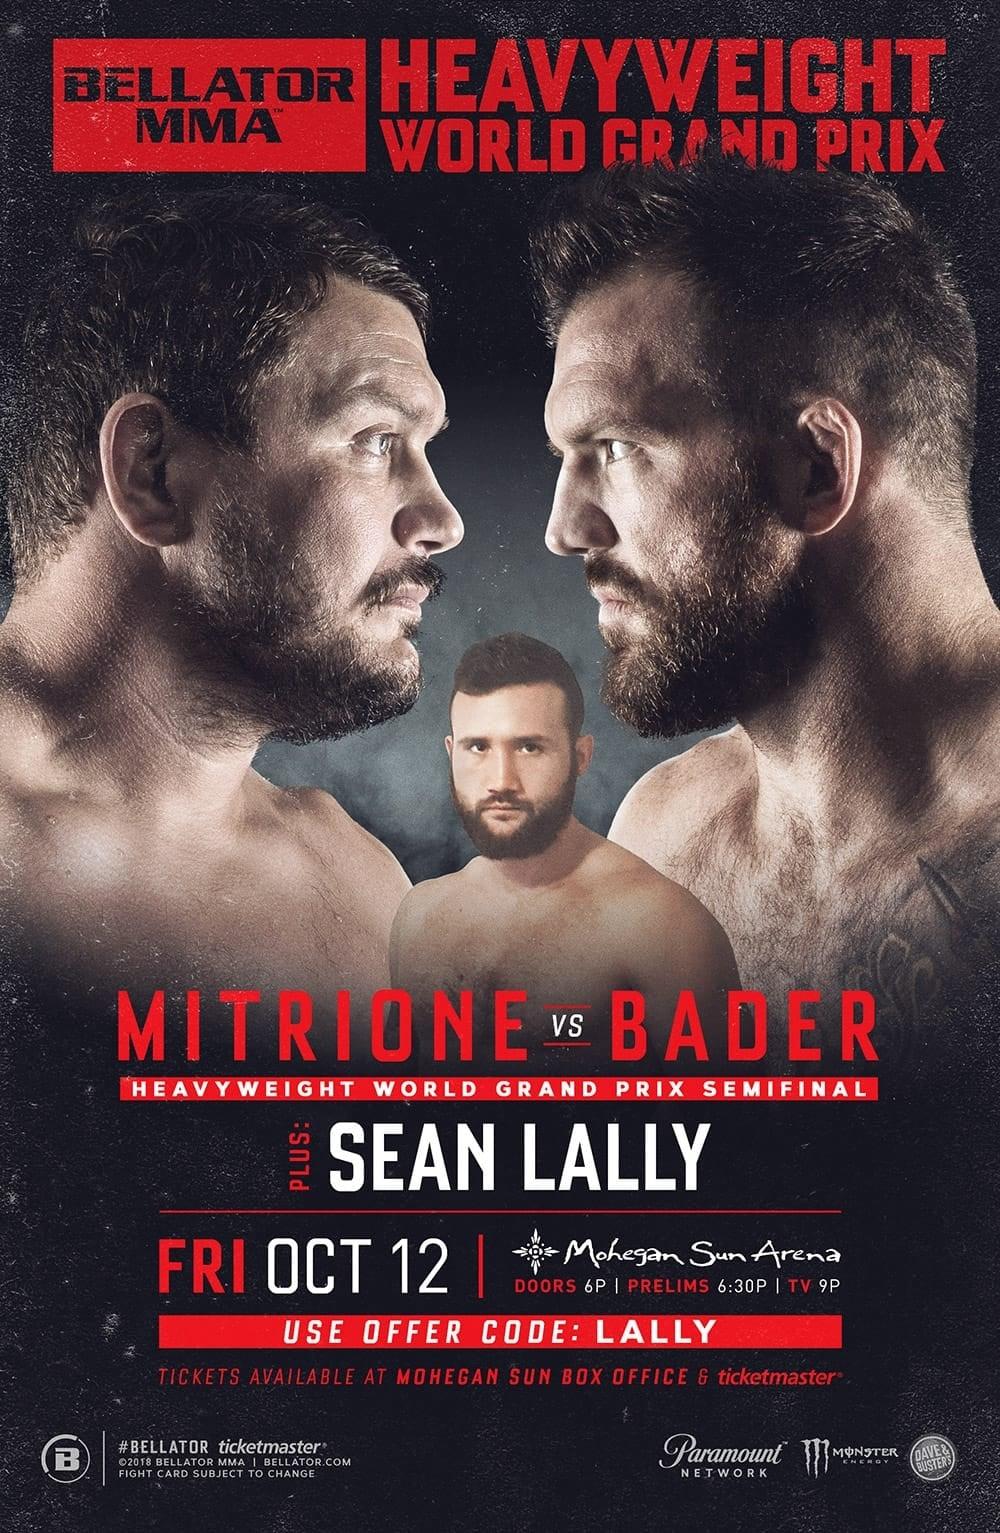 Bellator 207: Mitrione vs. Bader